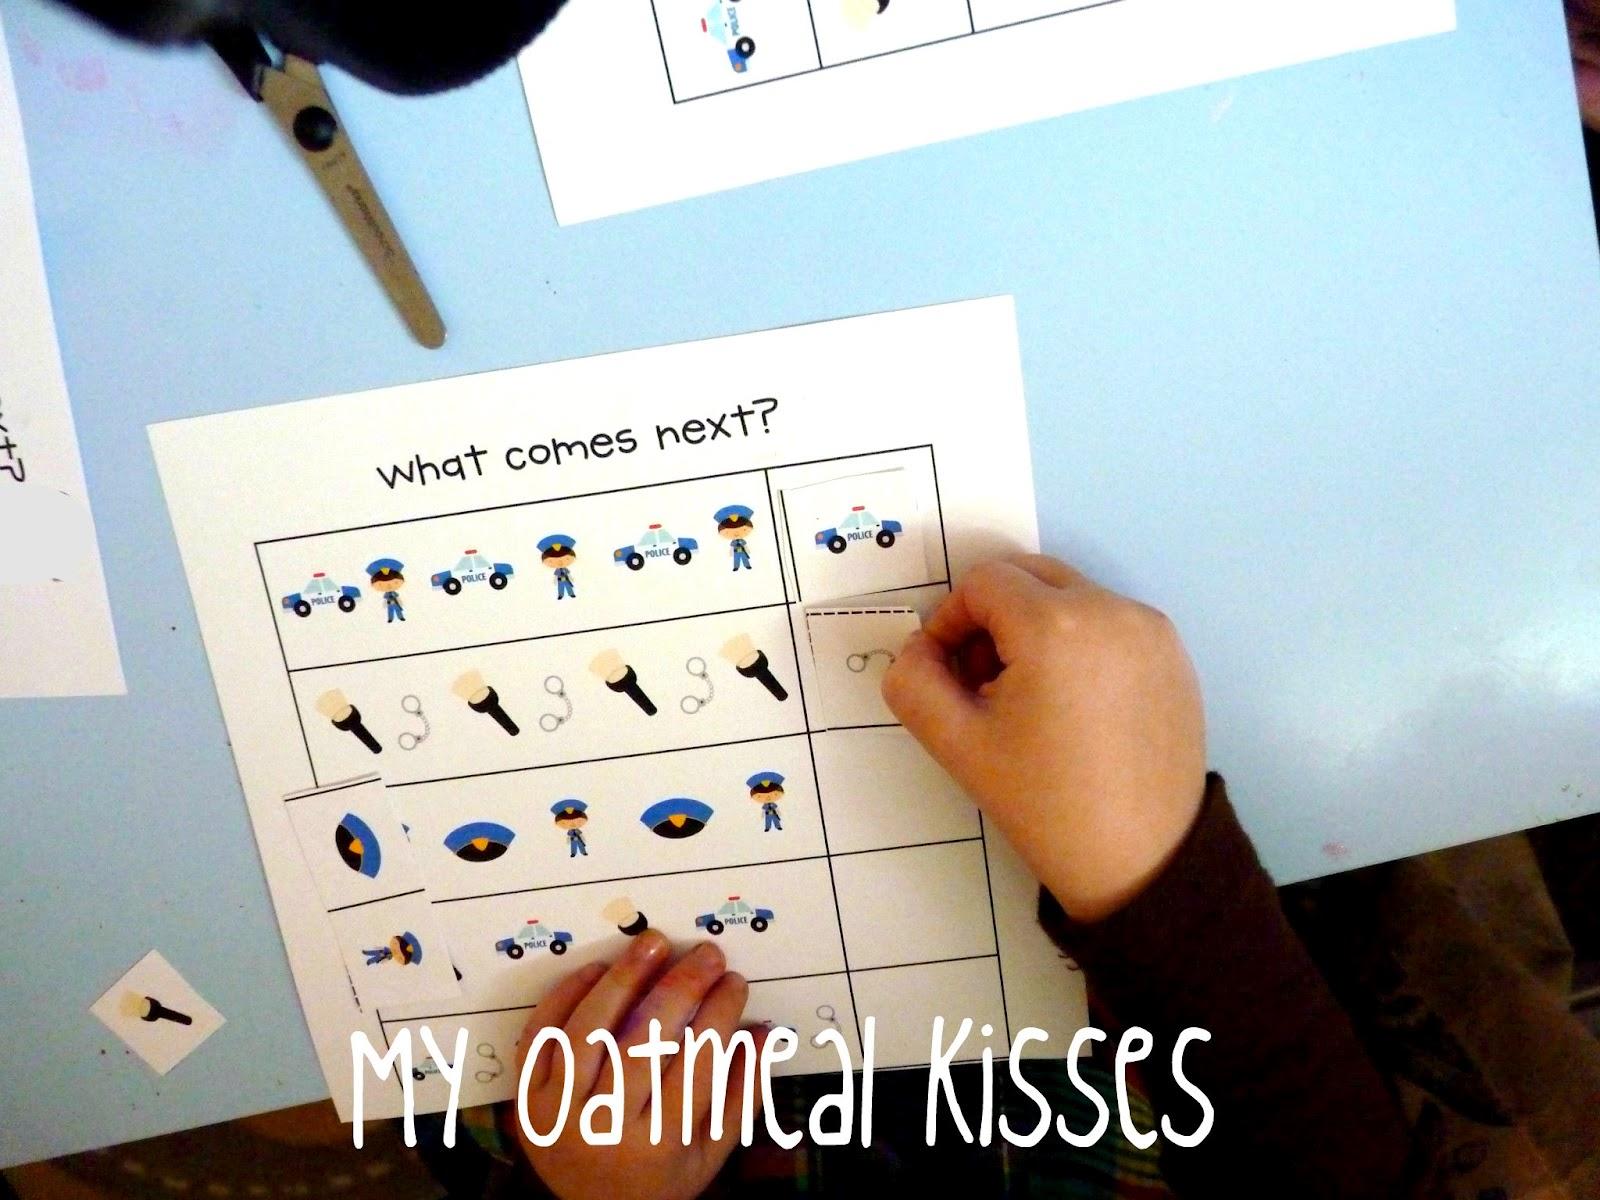 My Oatmeal Kisses Community Helpers